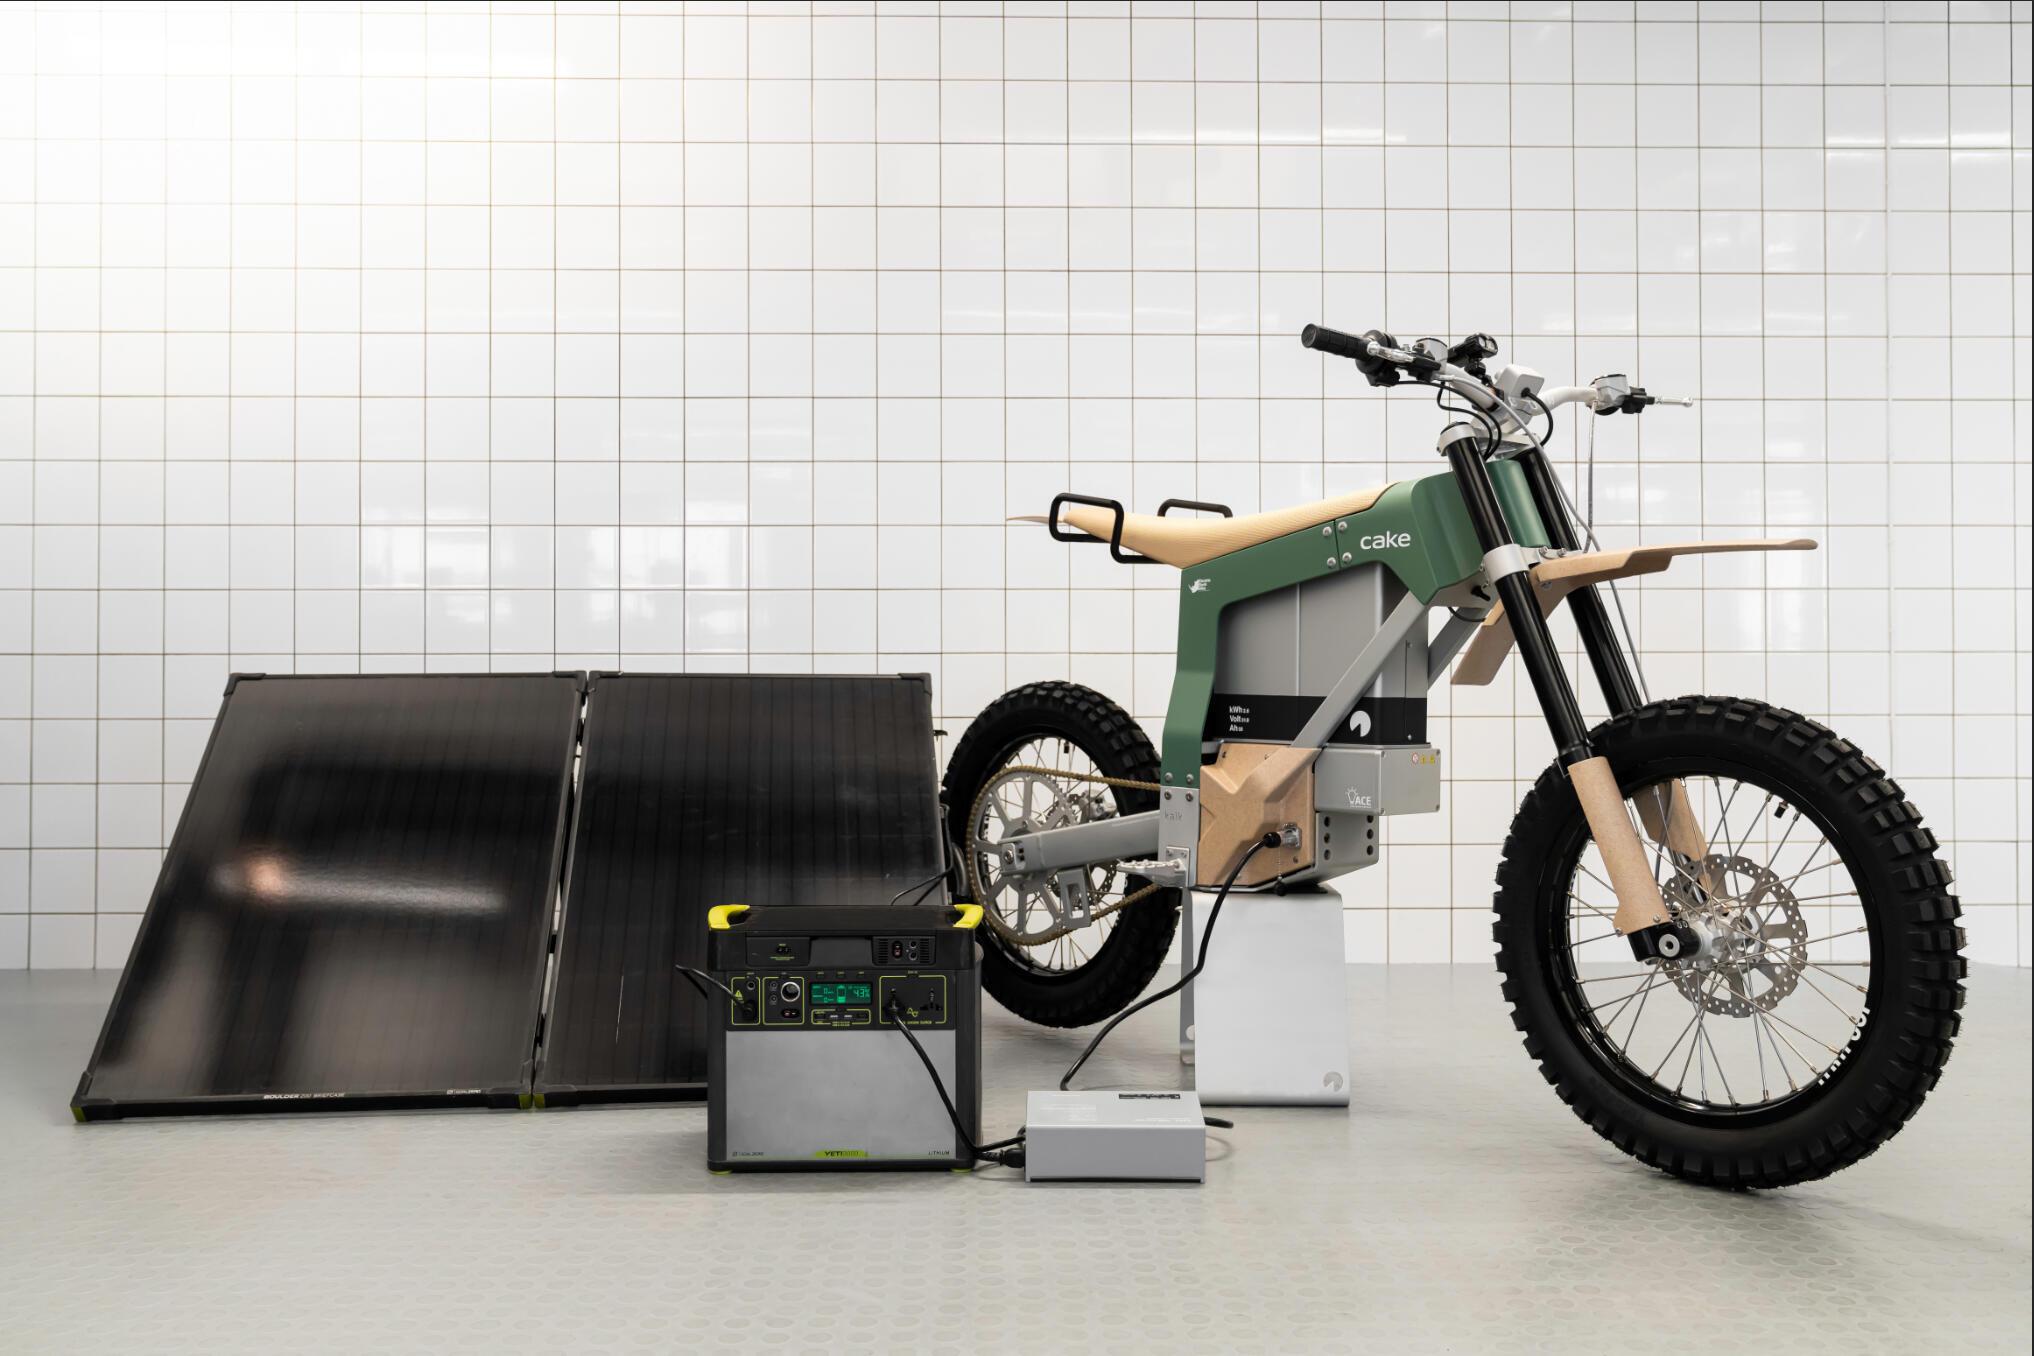 Kalk Anti-poaching bike_uses solar energy_Credit_Cake